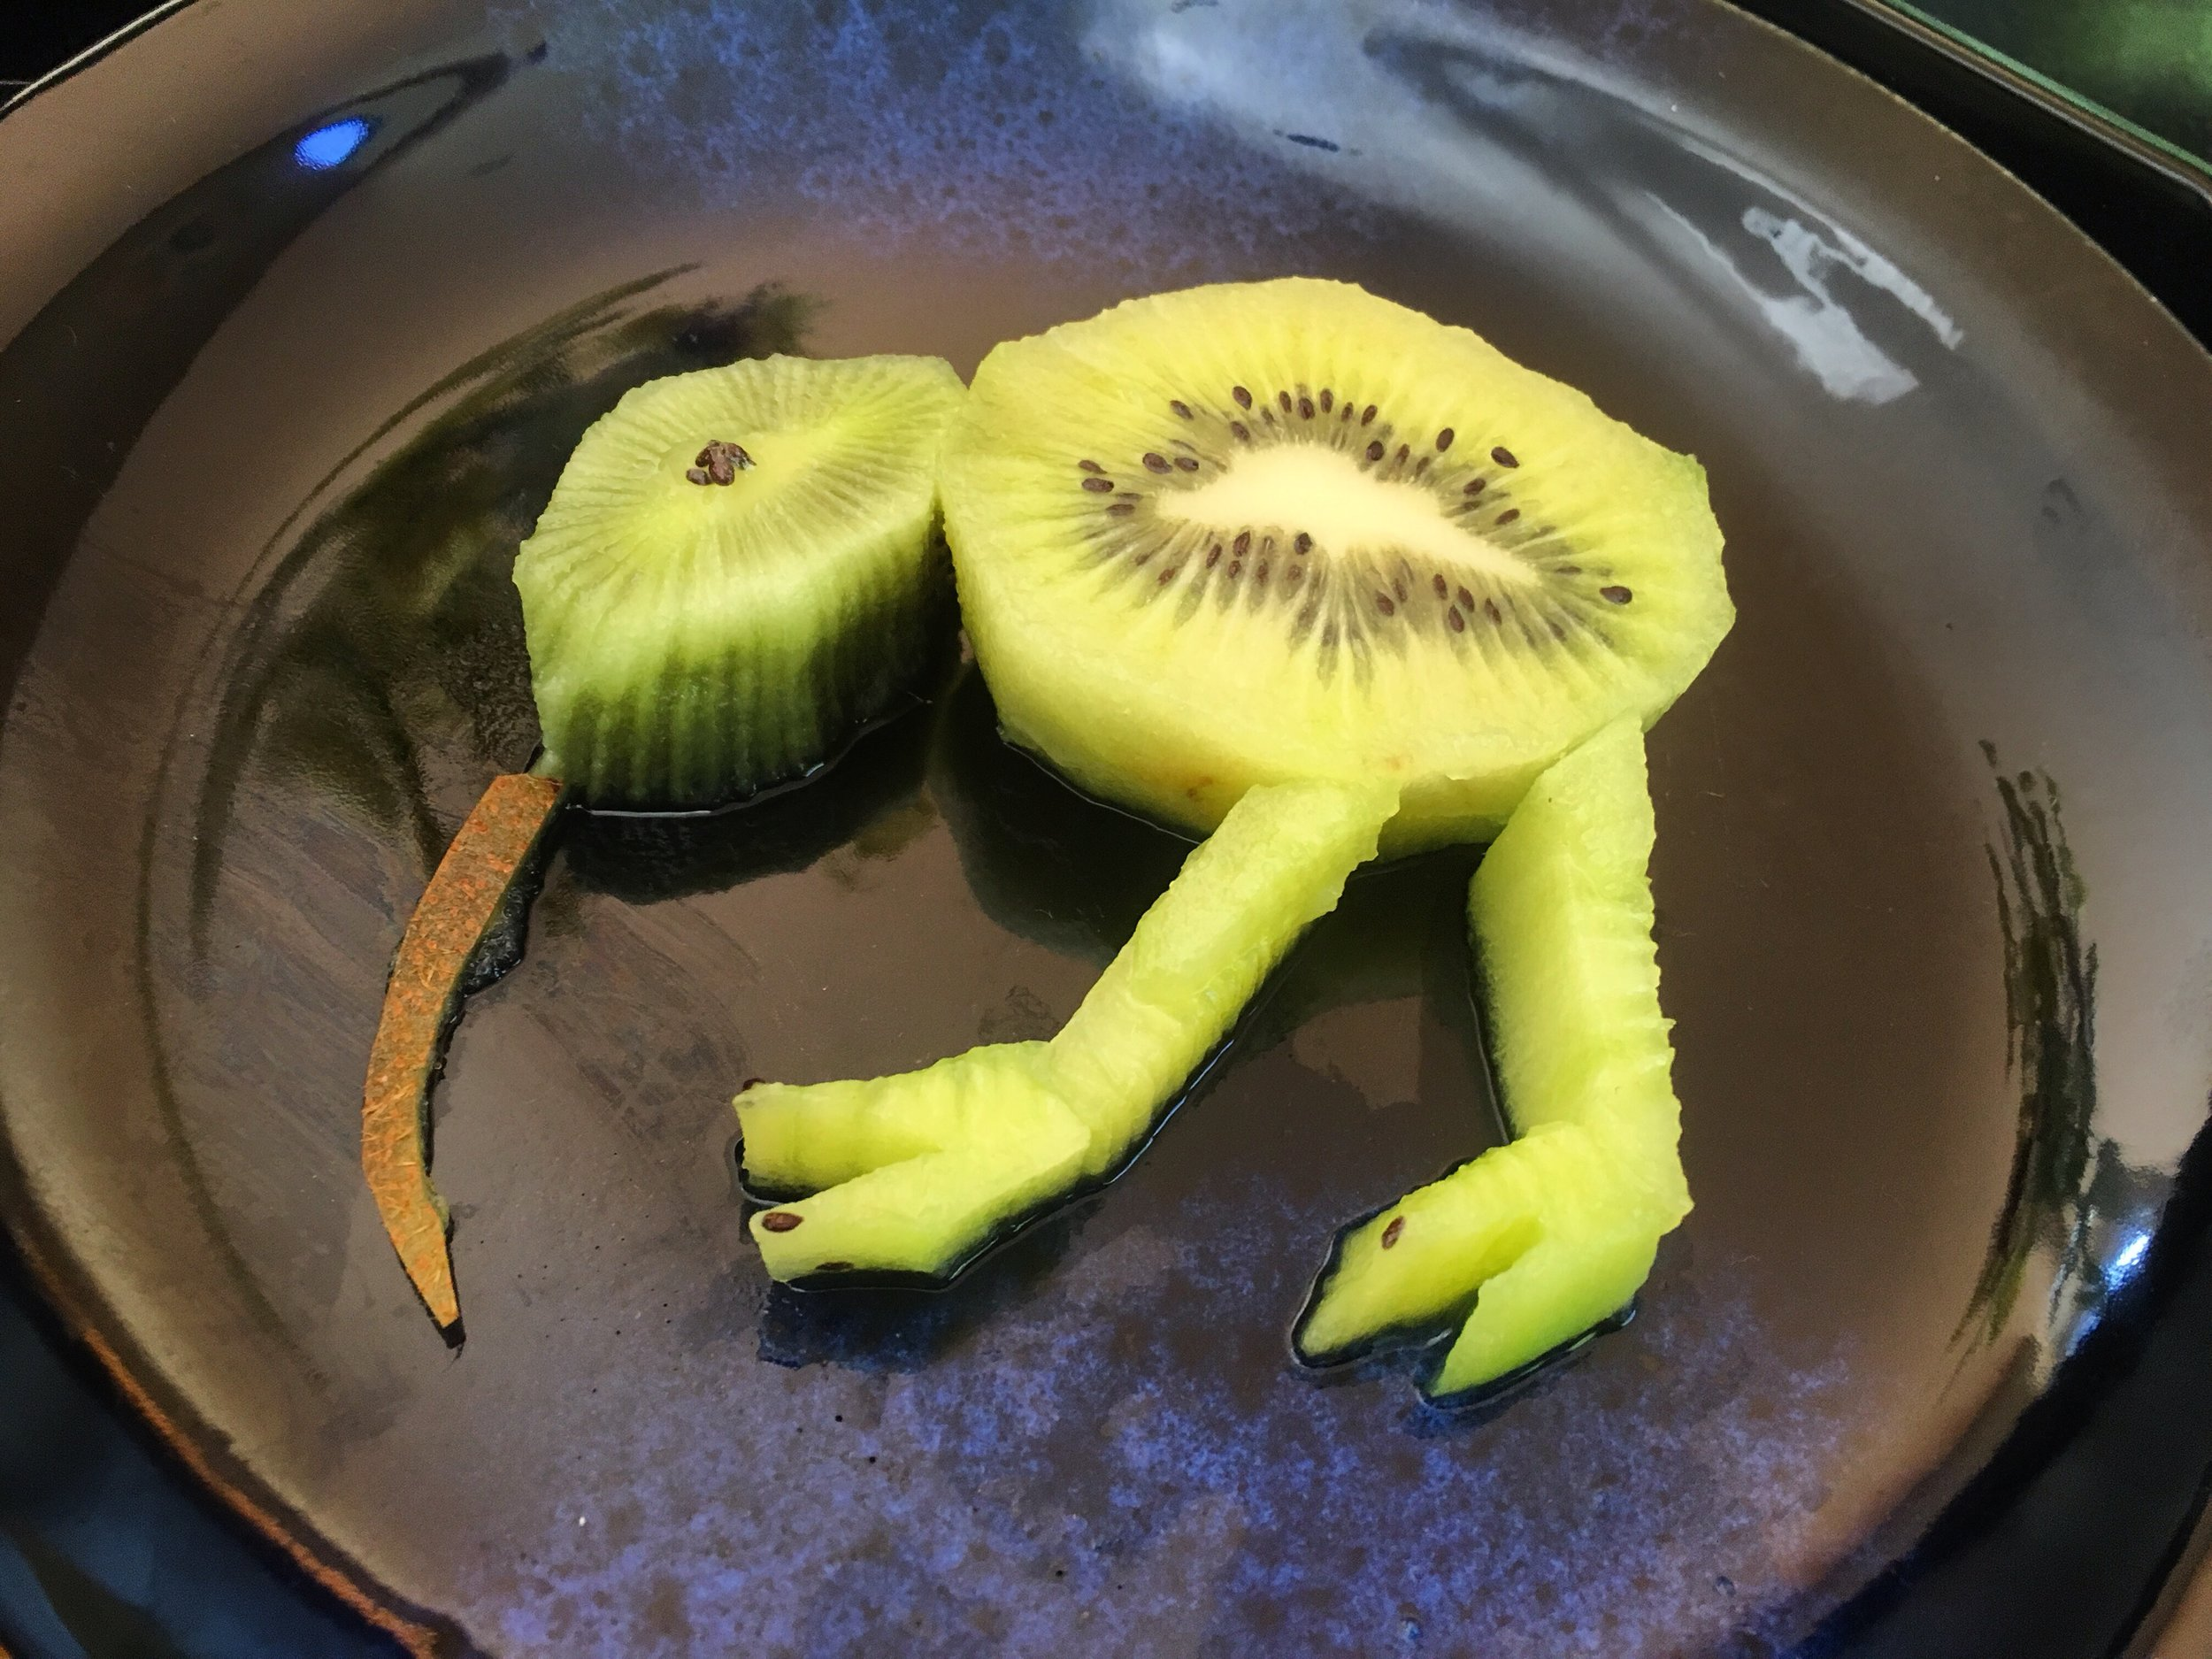 'Philbert The Flat-footed Kiwi'